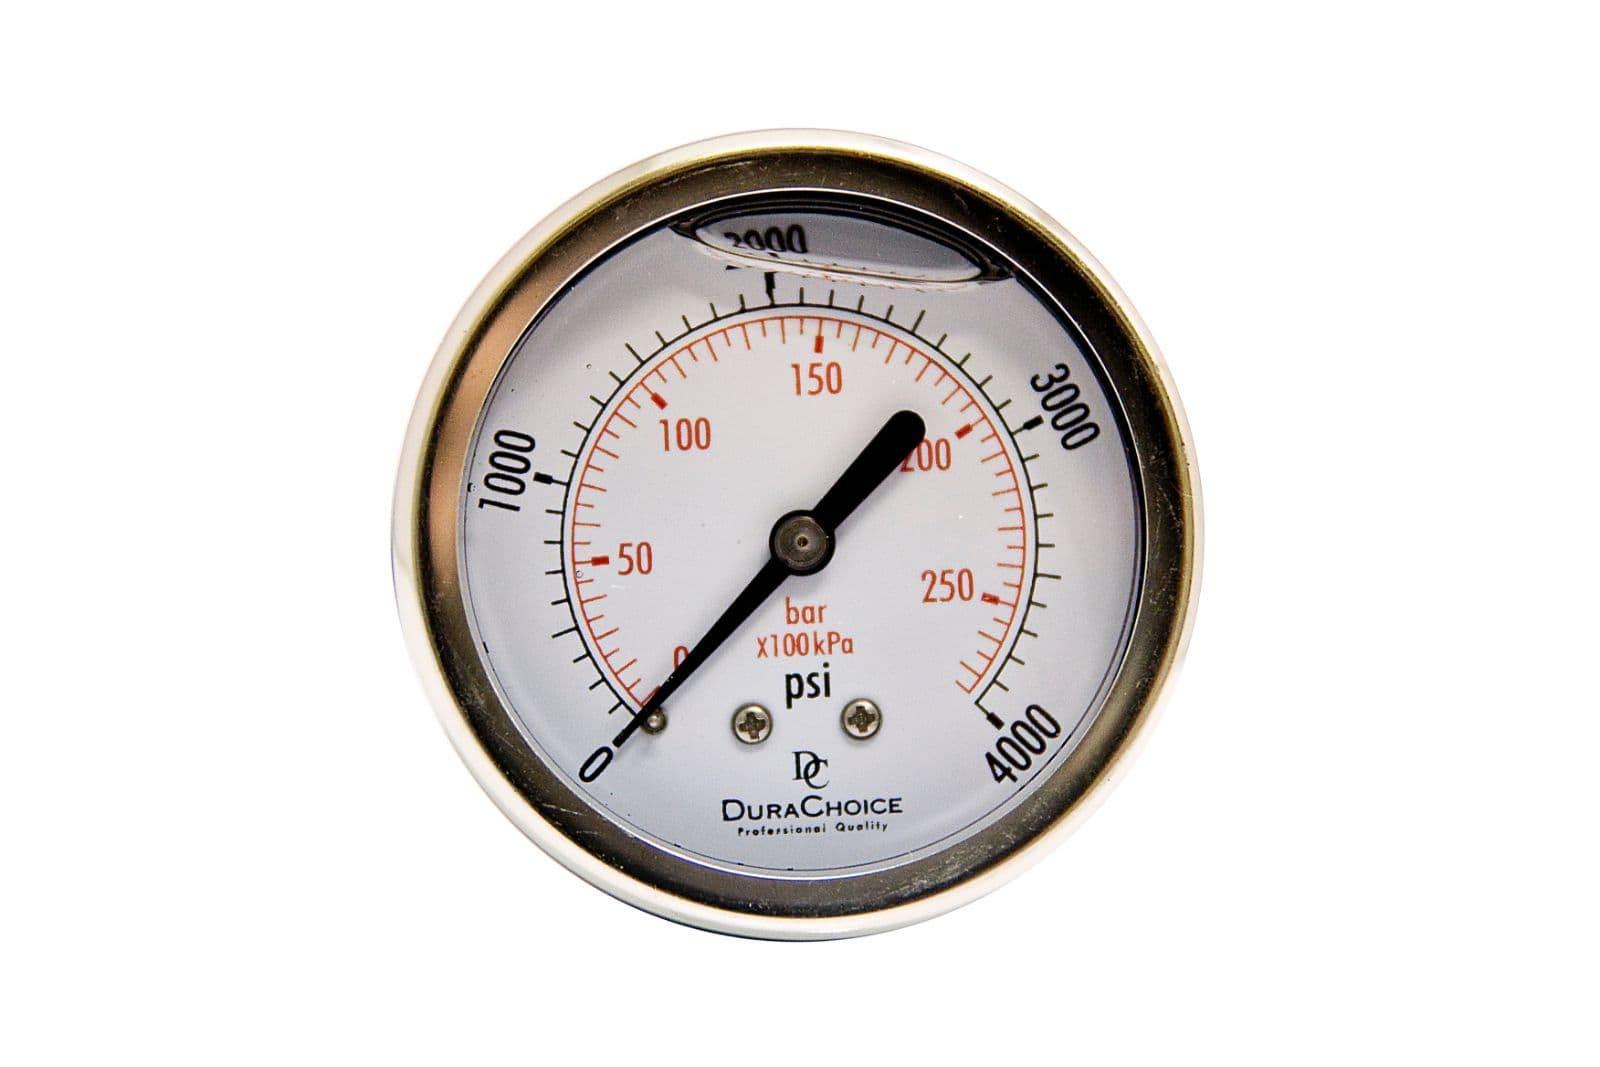 2'' Liquid Filled Pressure Gauges - Stainless Steel Case, Brass, 1/4'' NPT, Center Back Mount Connection, 0-4000PSI by DuraChoice